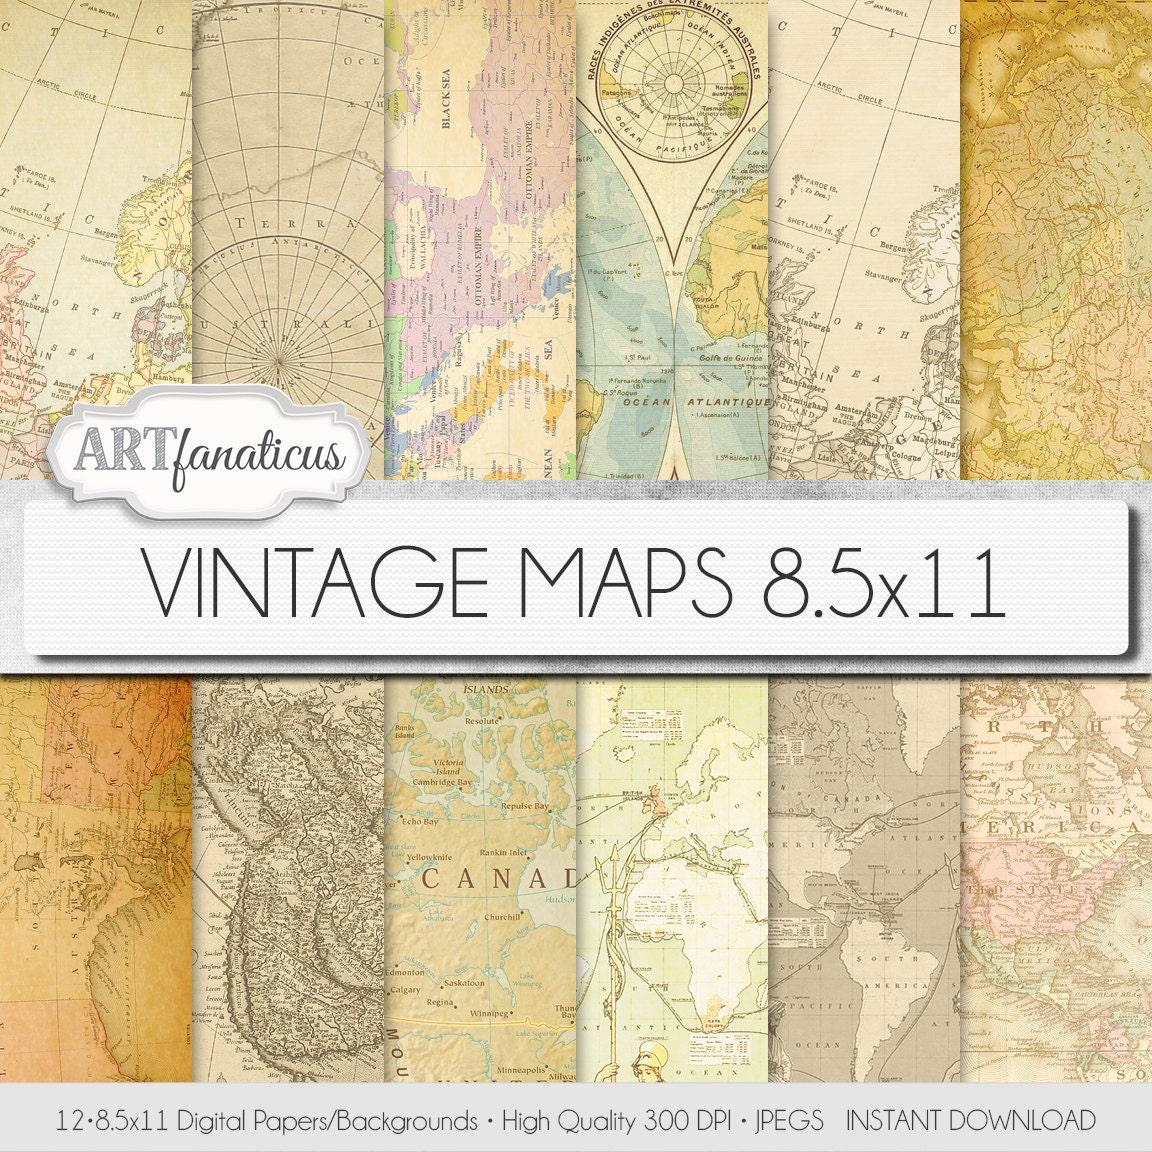 Vintage maps digital paper vintage maps vintage maps 85x11 digital paper vintage maps backgroundsantique maps gumiabroncs Image collections